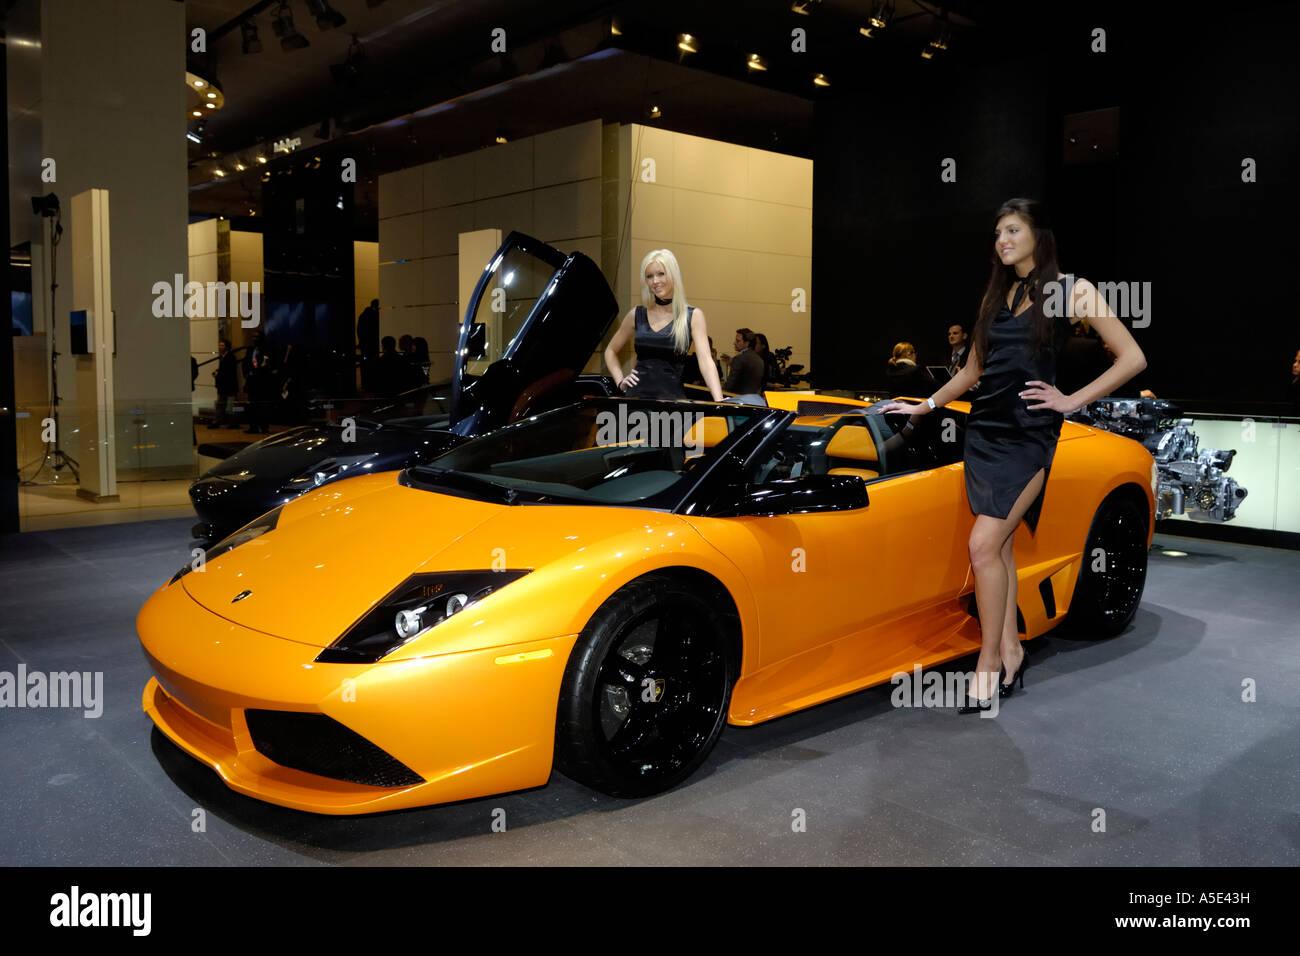 Lamborghini Murcielago Lp640 Imagenes De Stock Lamborghini